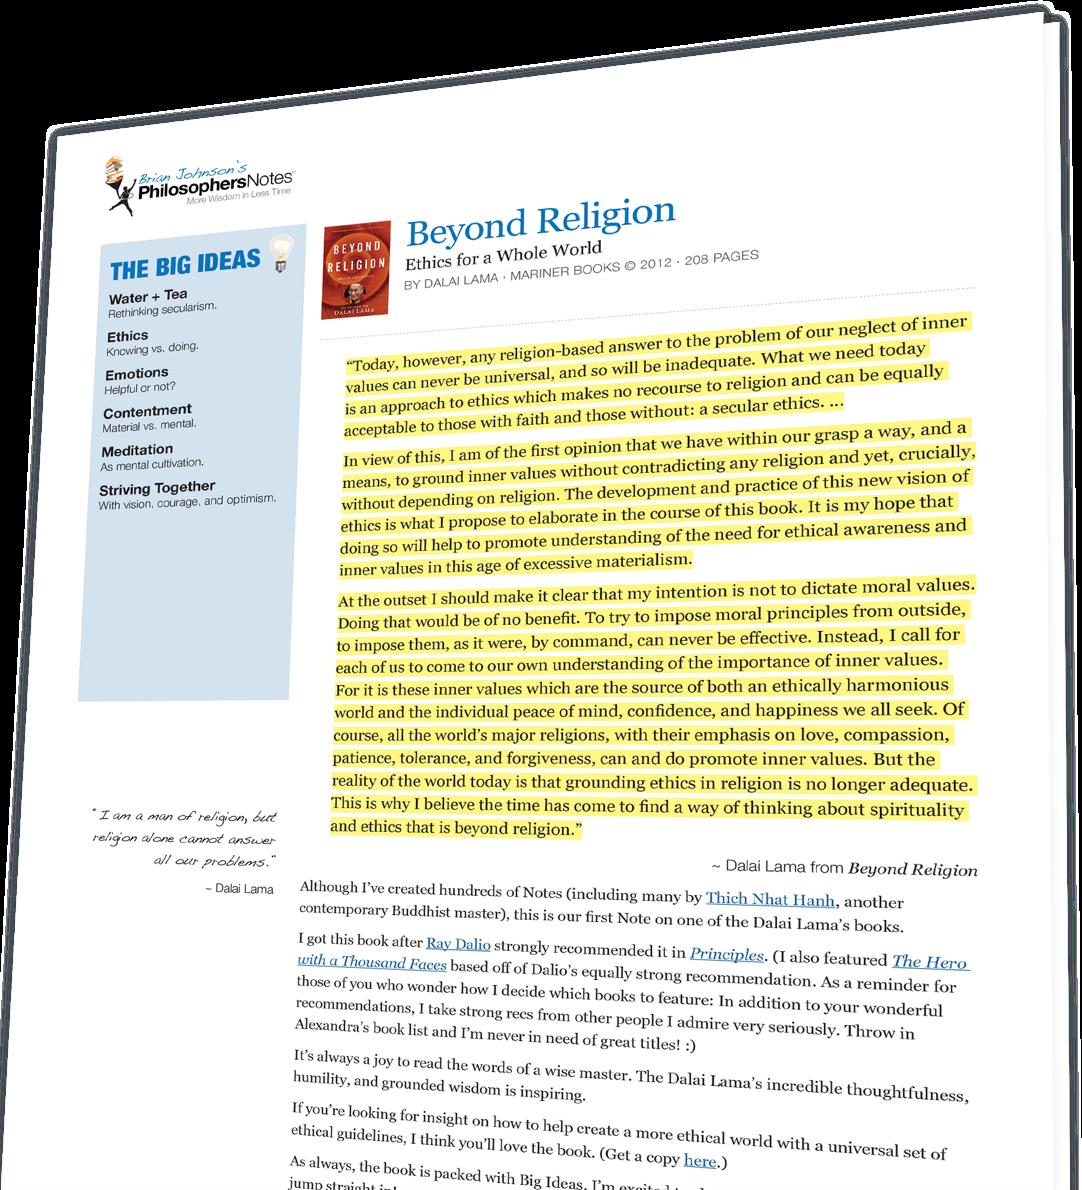 Beyond Religion by Dalai Lama - PhilosophersNotes | Optimize